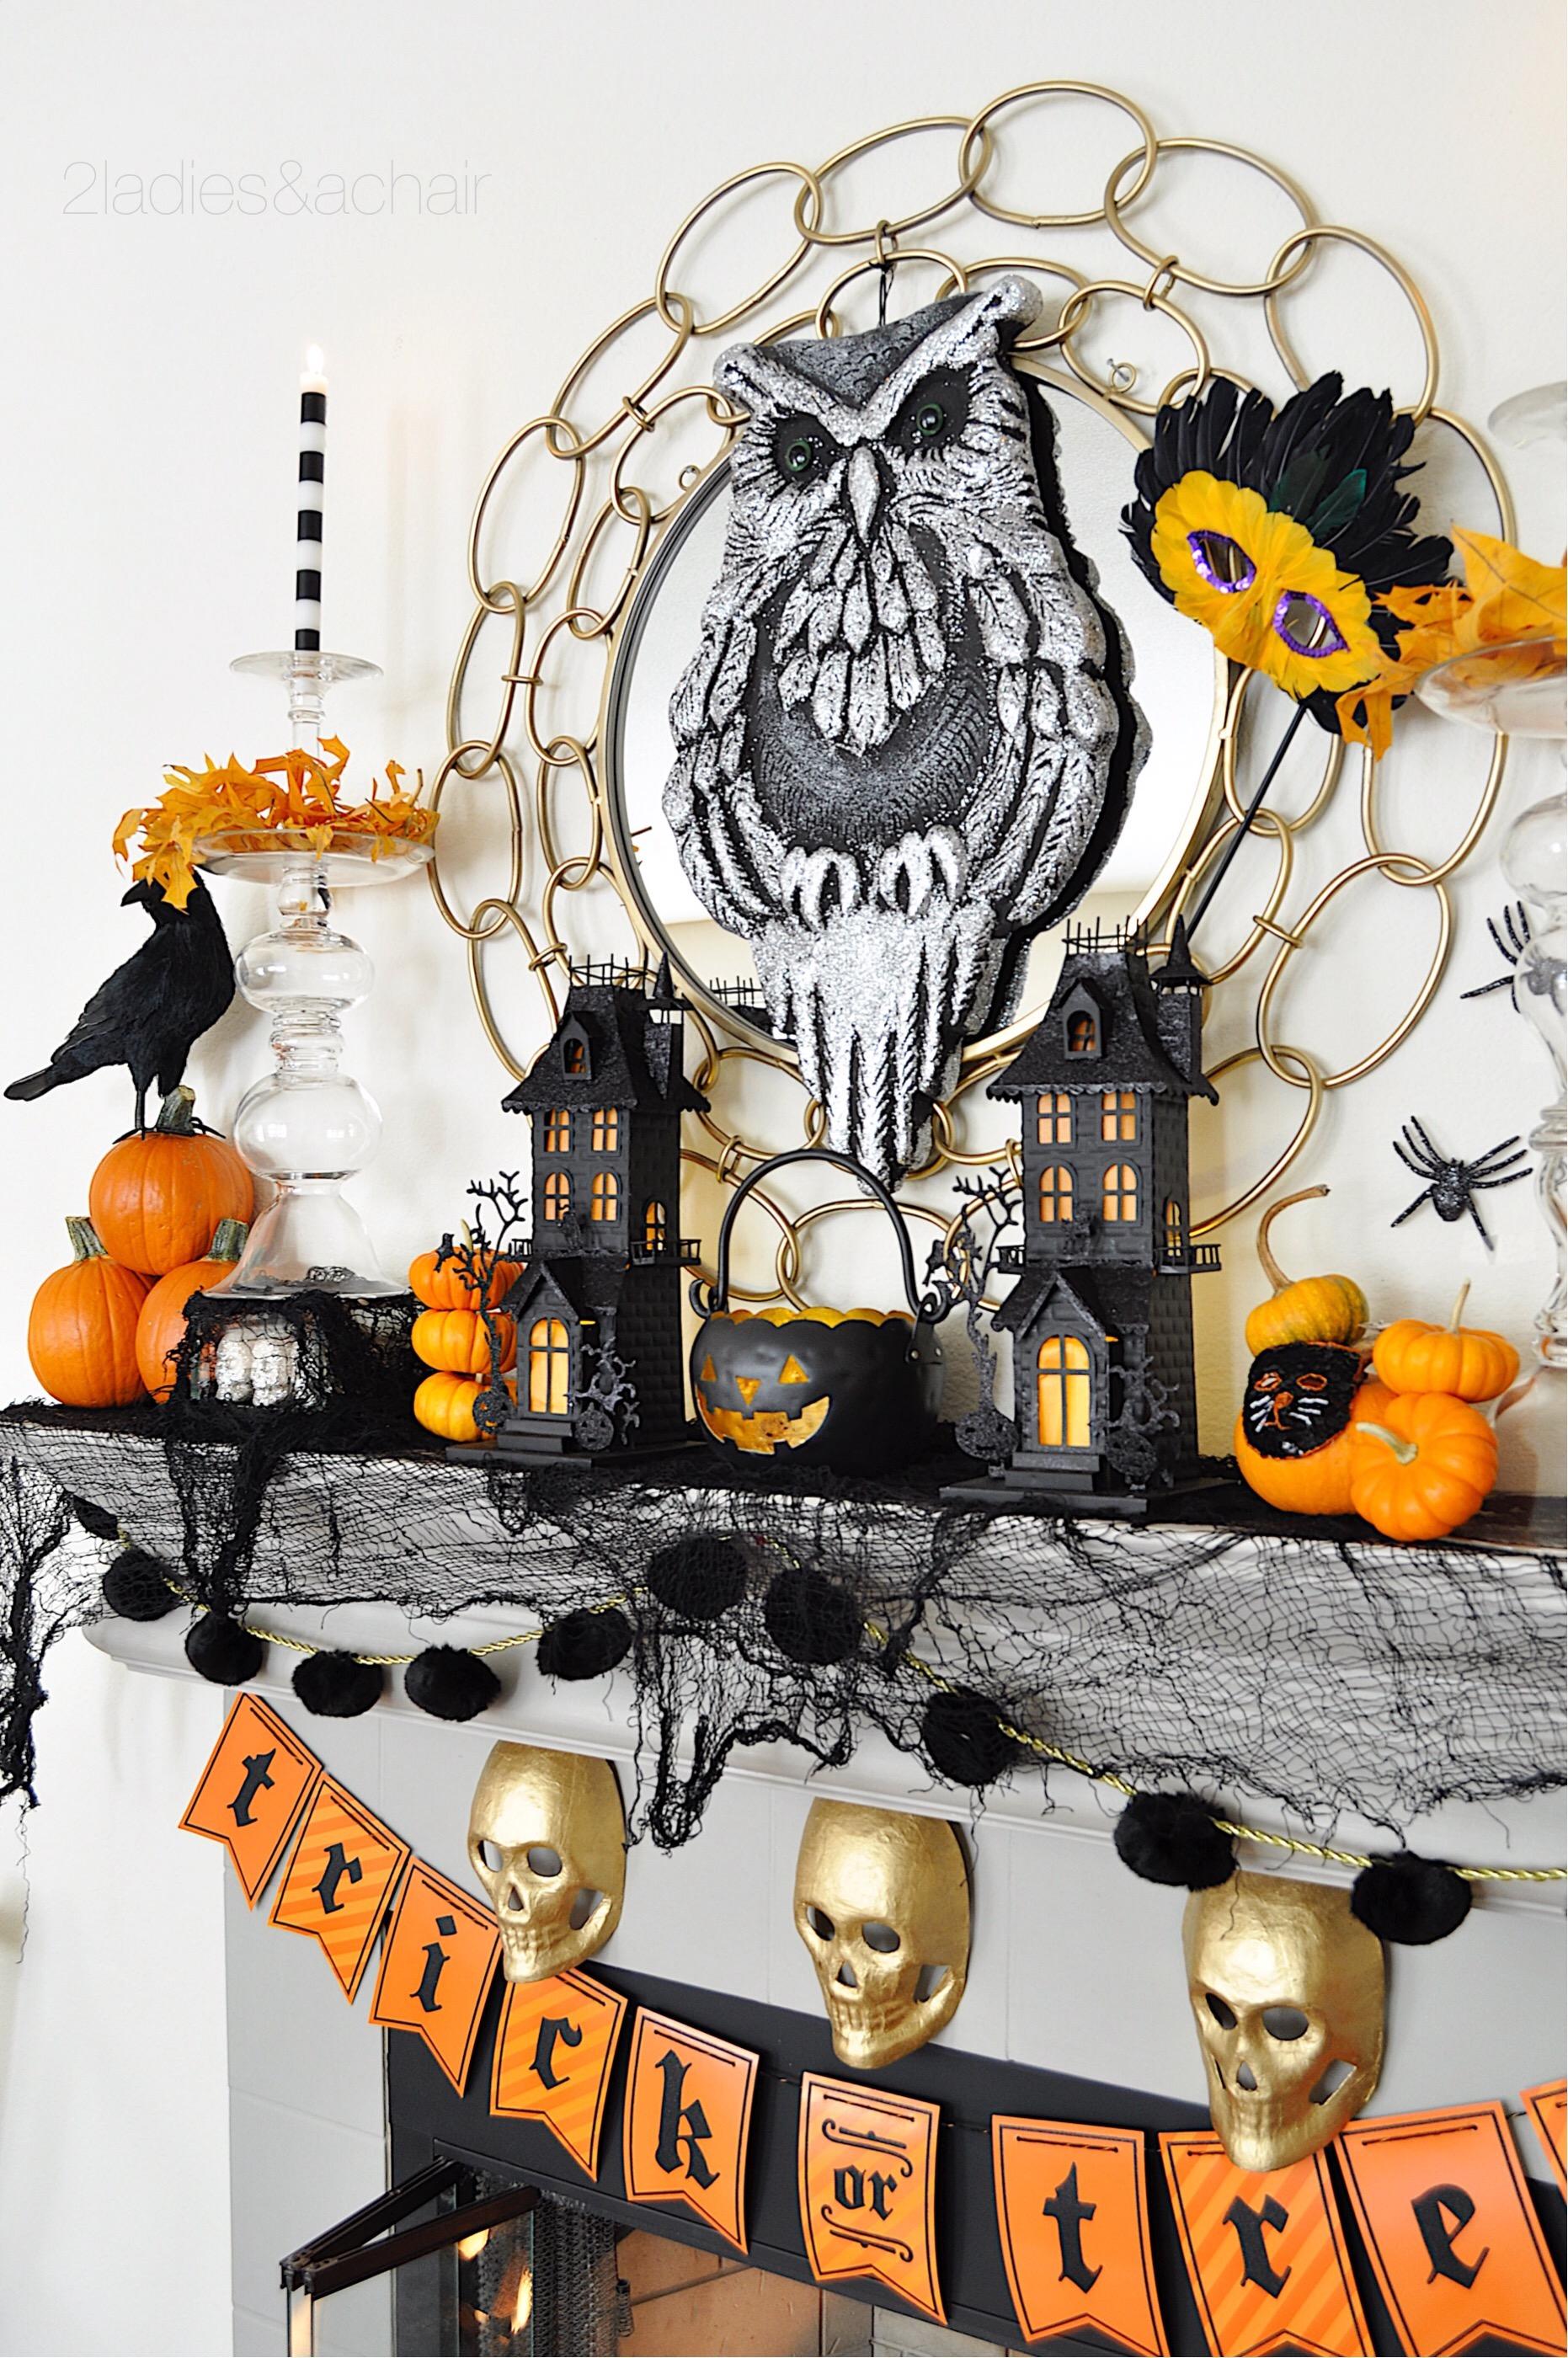 halloween mantel decorations FullSizeRender(87).jpg